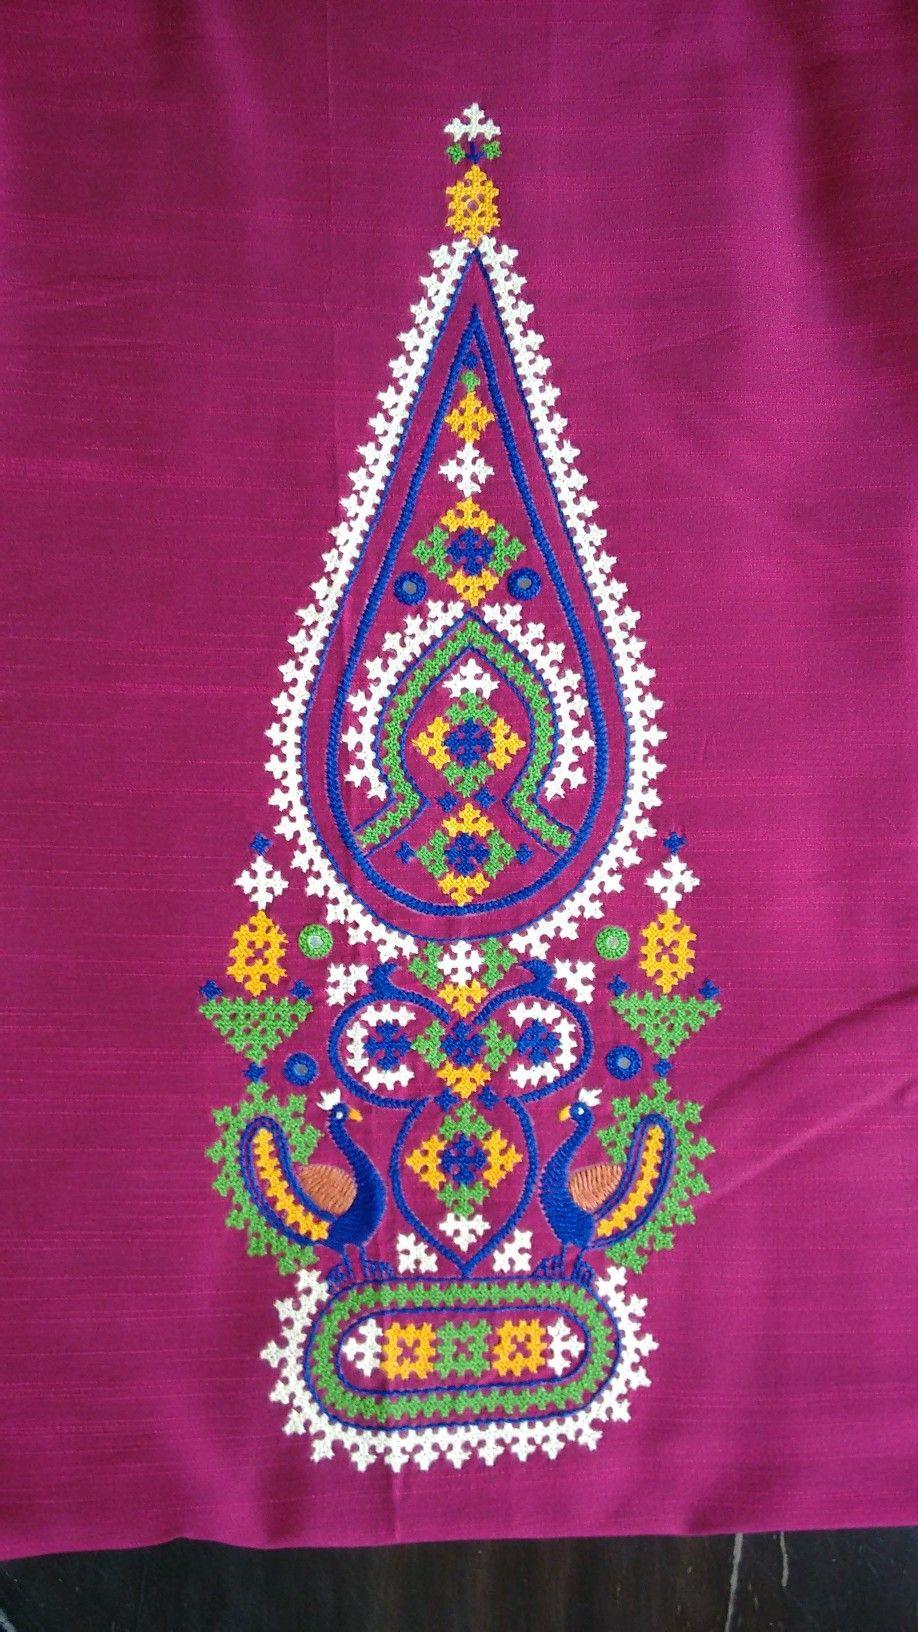 Pin by anita kadam on kutch work pinterest embroidery hand